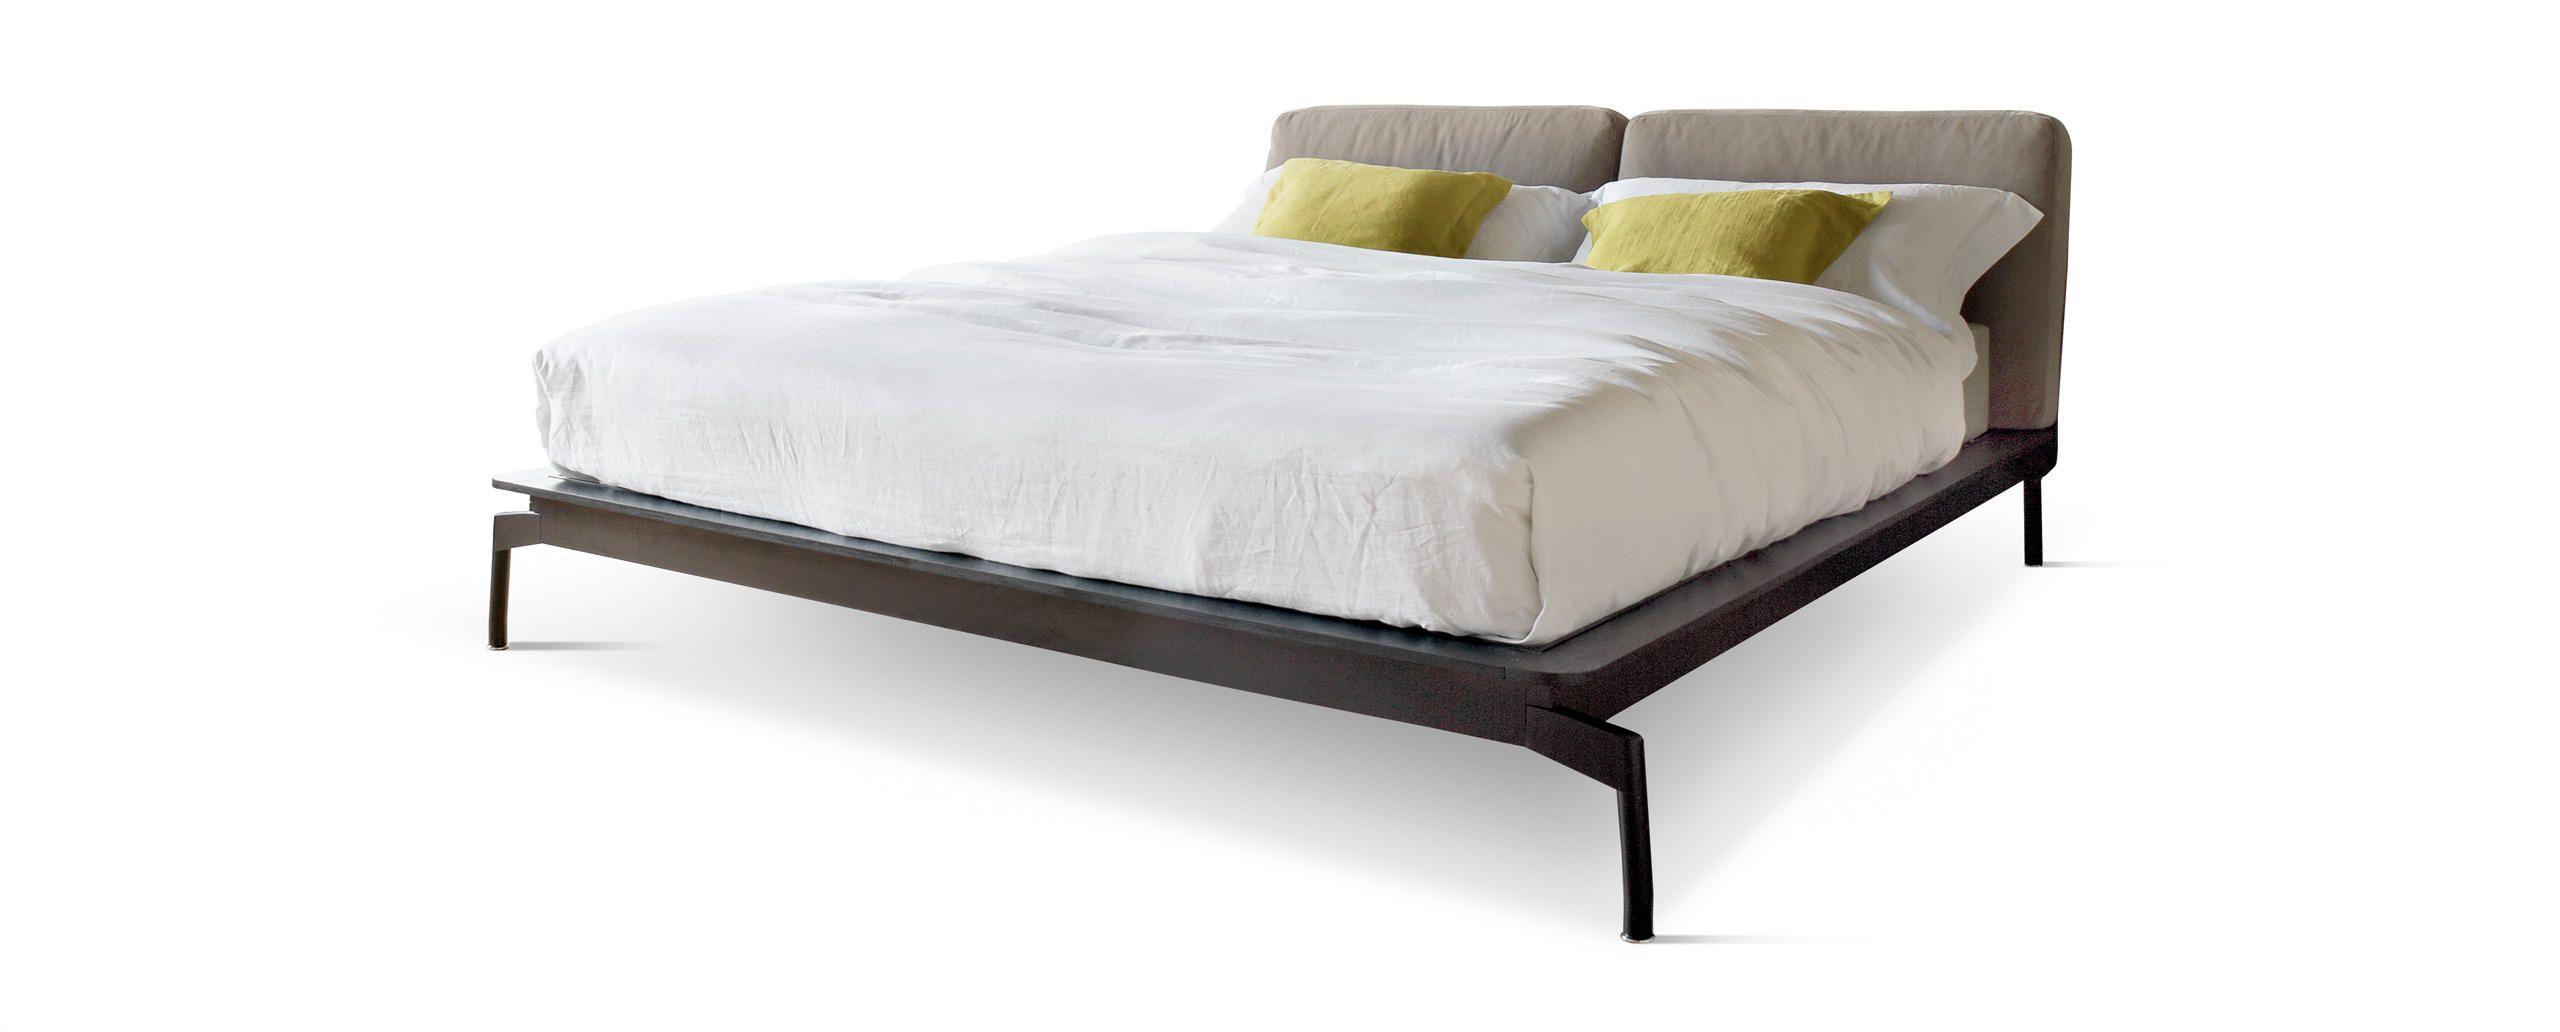 L40 Sled Slim Bed by Cassina - Via Designresource.co   bed   Pinterest